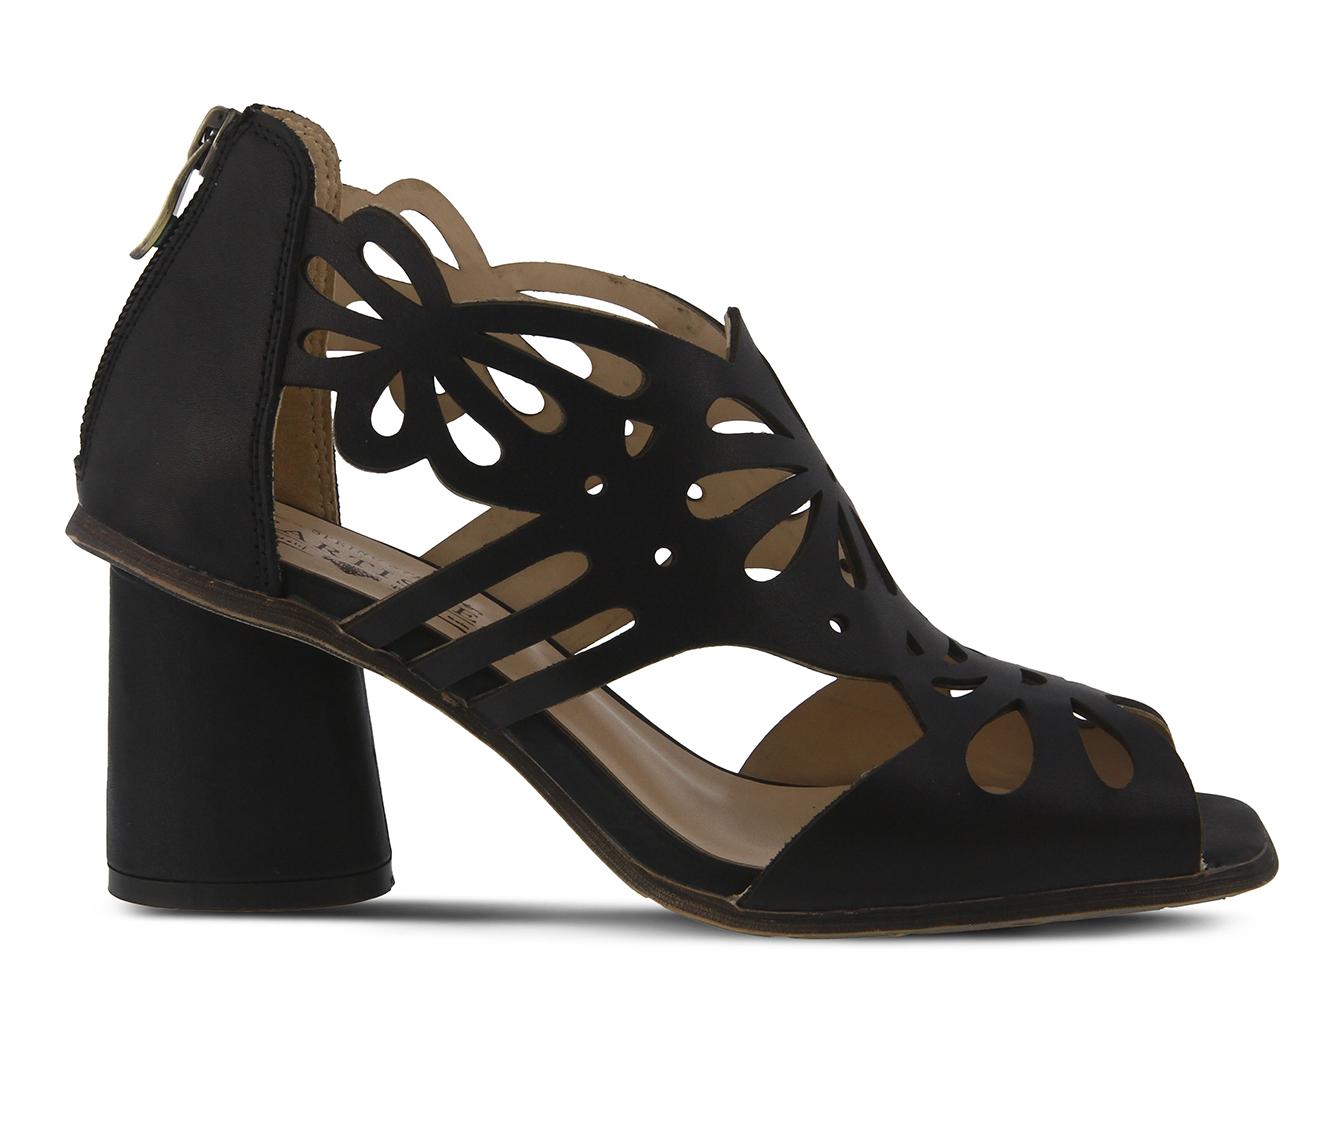 L'Artiste Flamenco Women's Dress Shoe (Black Leather)